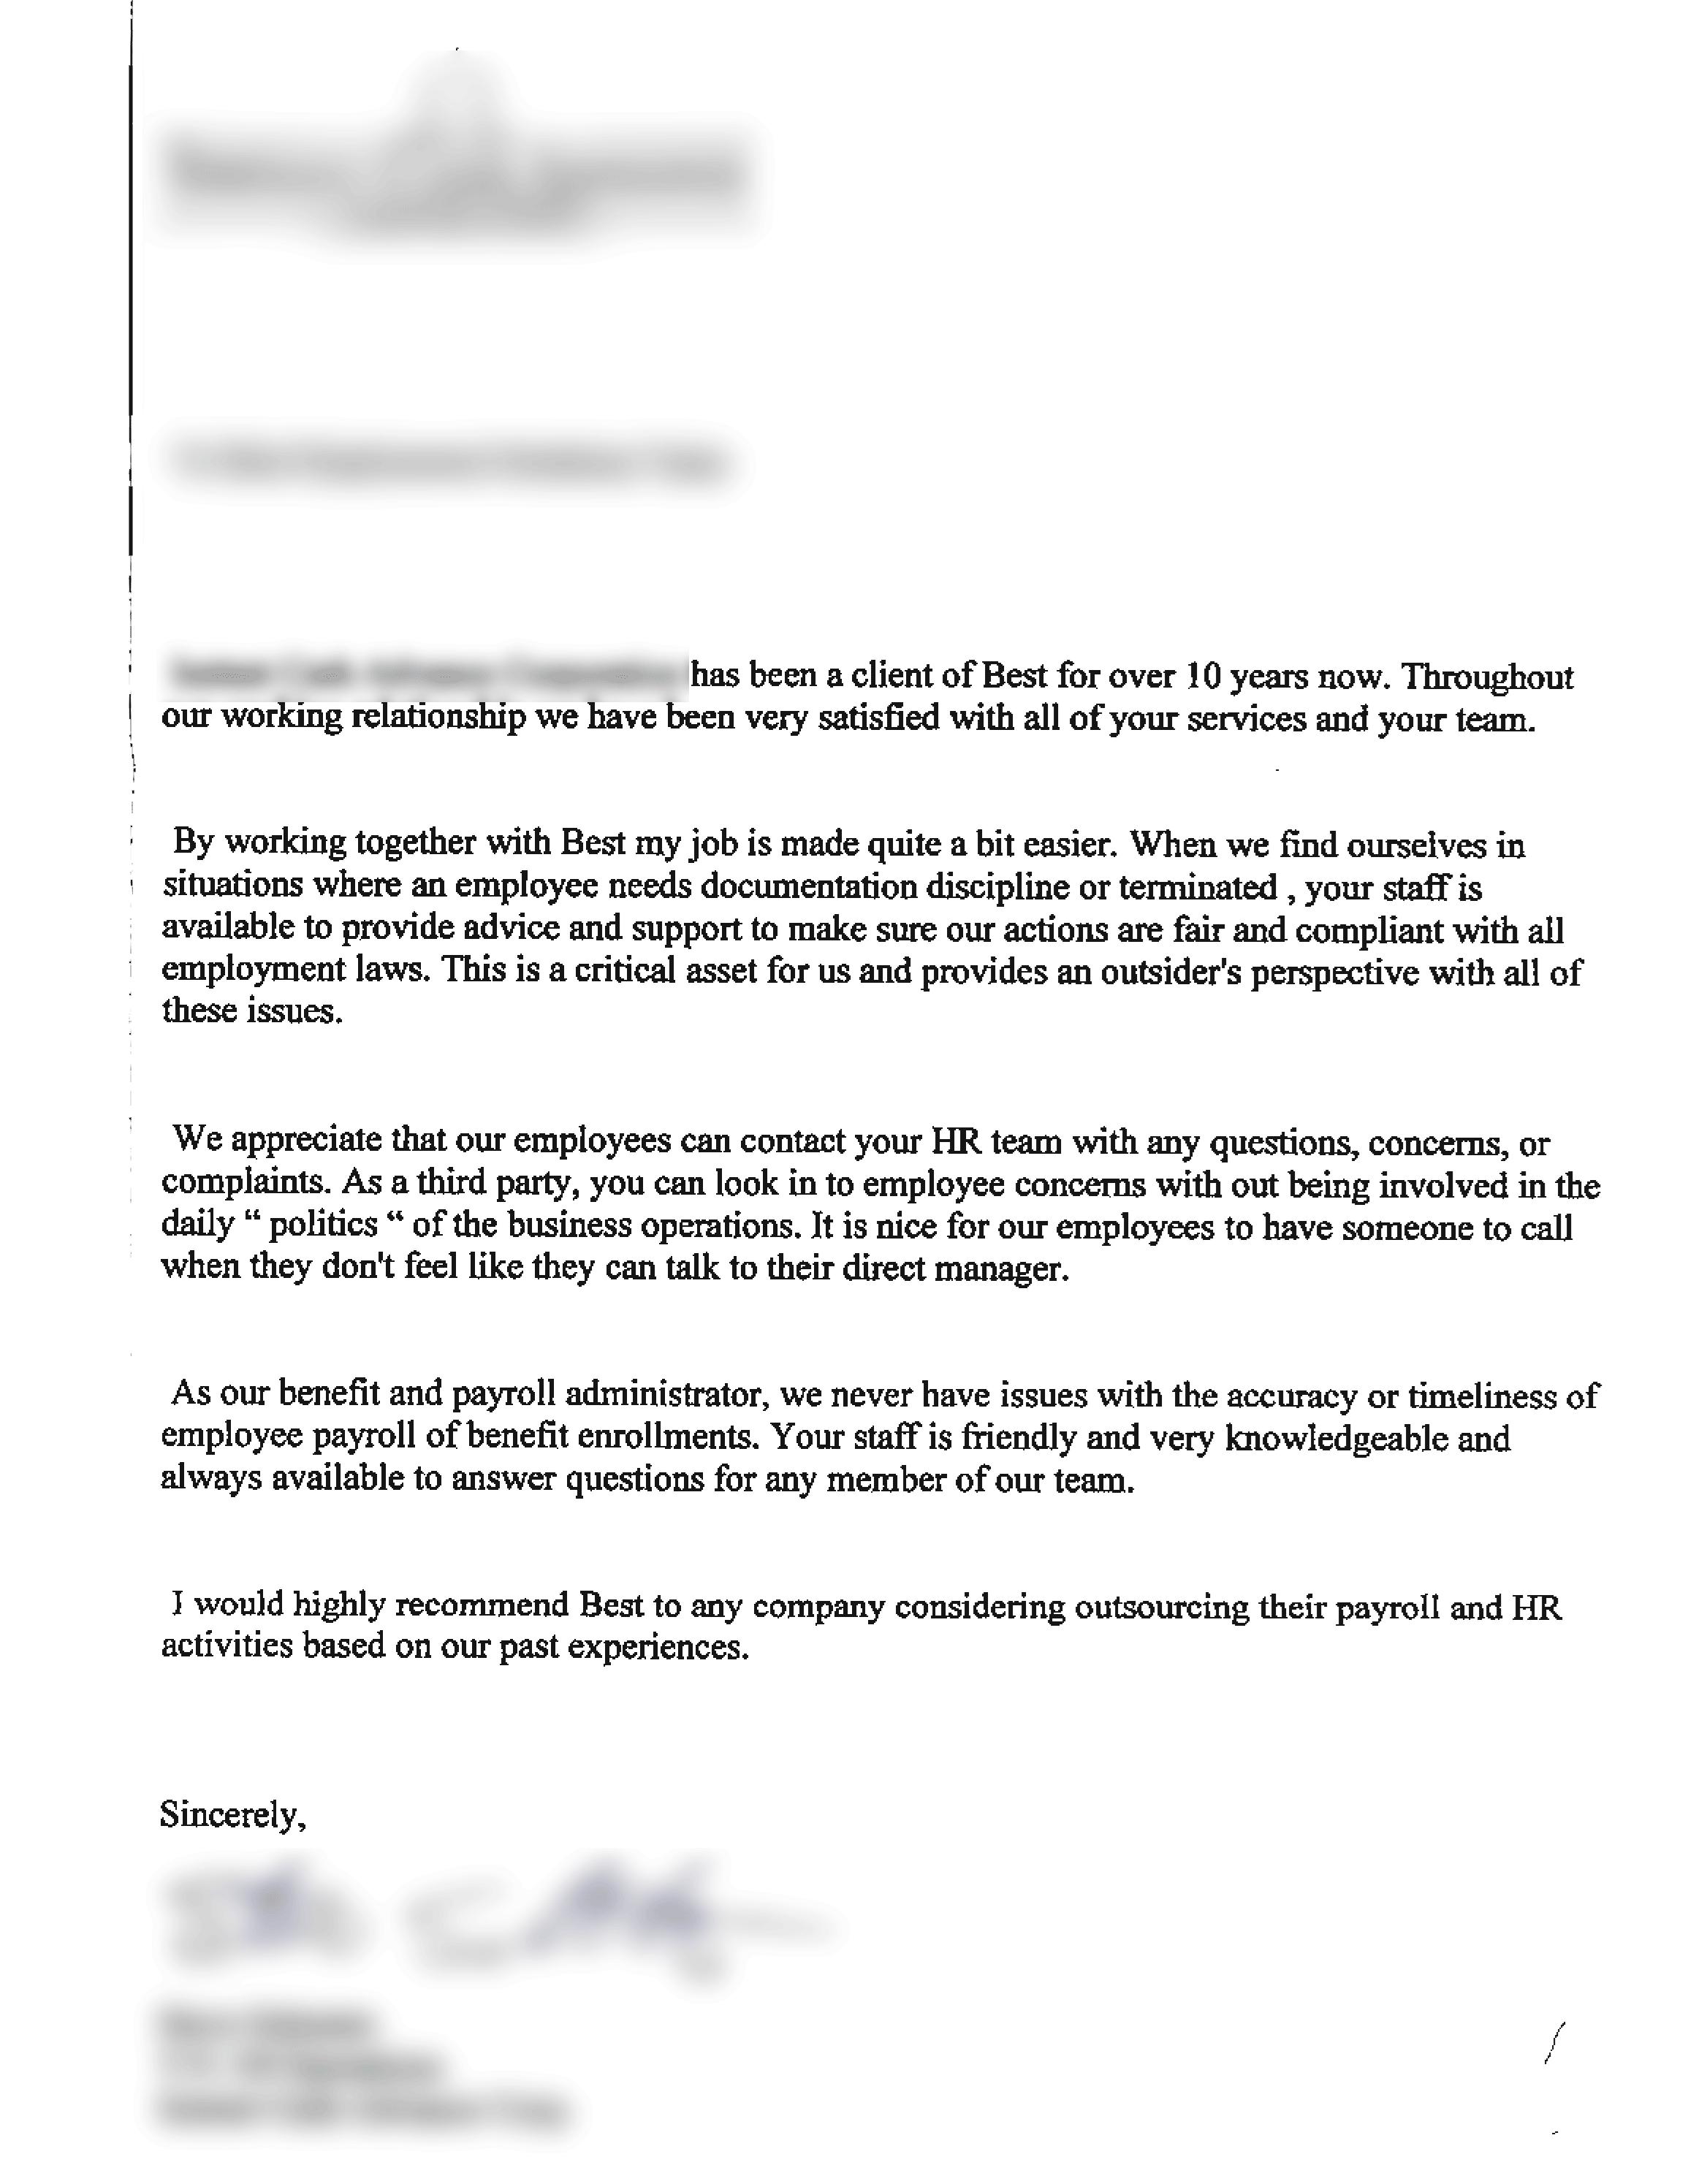 Instant-Cash-Advance-Signed-Reference-Letter.png